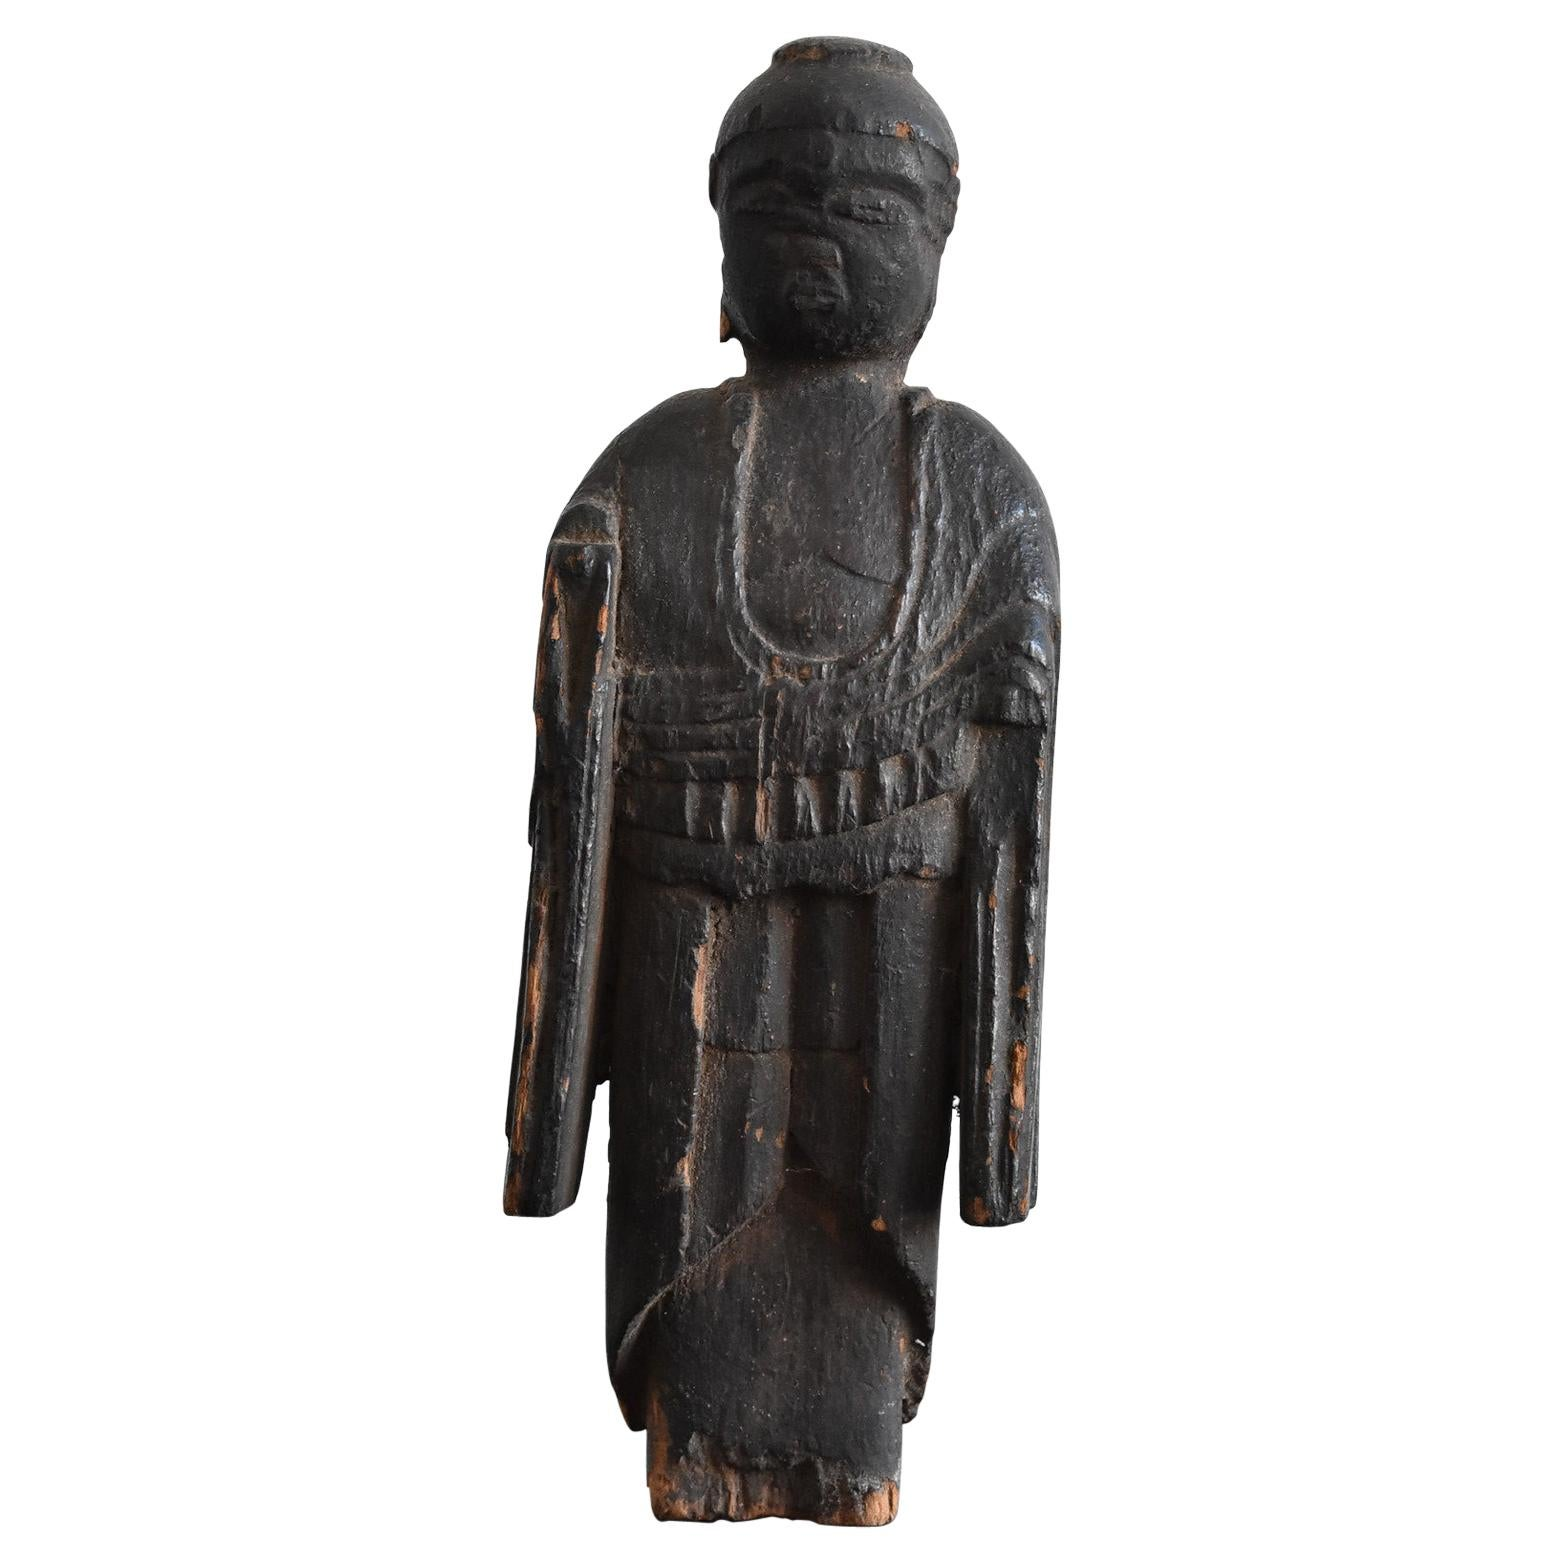 "Japanese Antiques Old Wooden Buddha Statue ""Nyorai"" Late Edo Period 1750-1850"